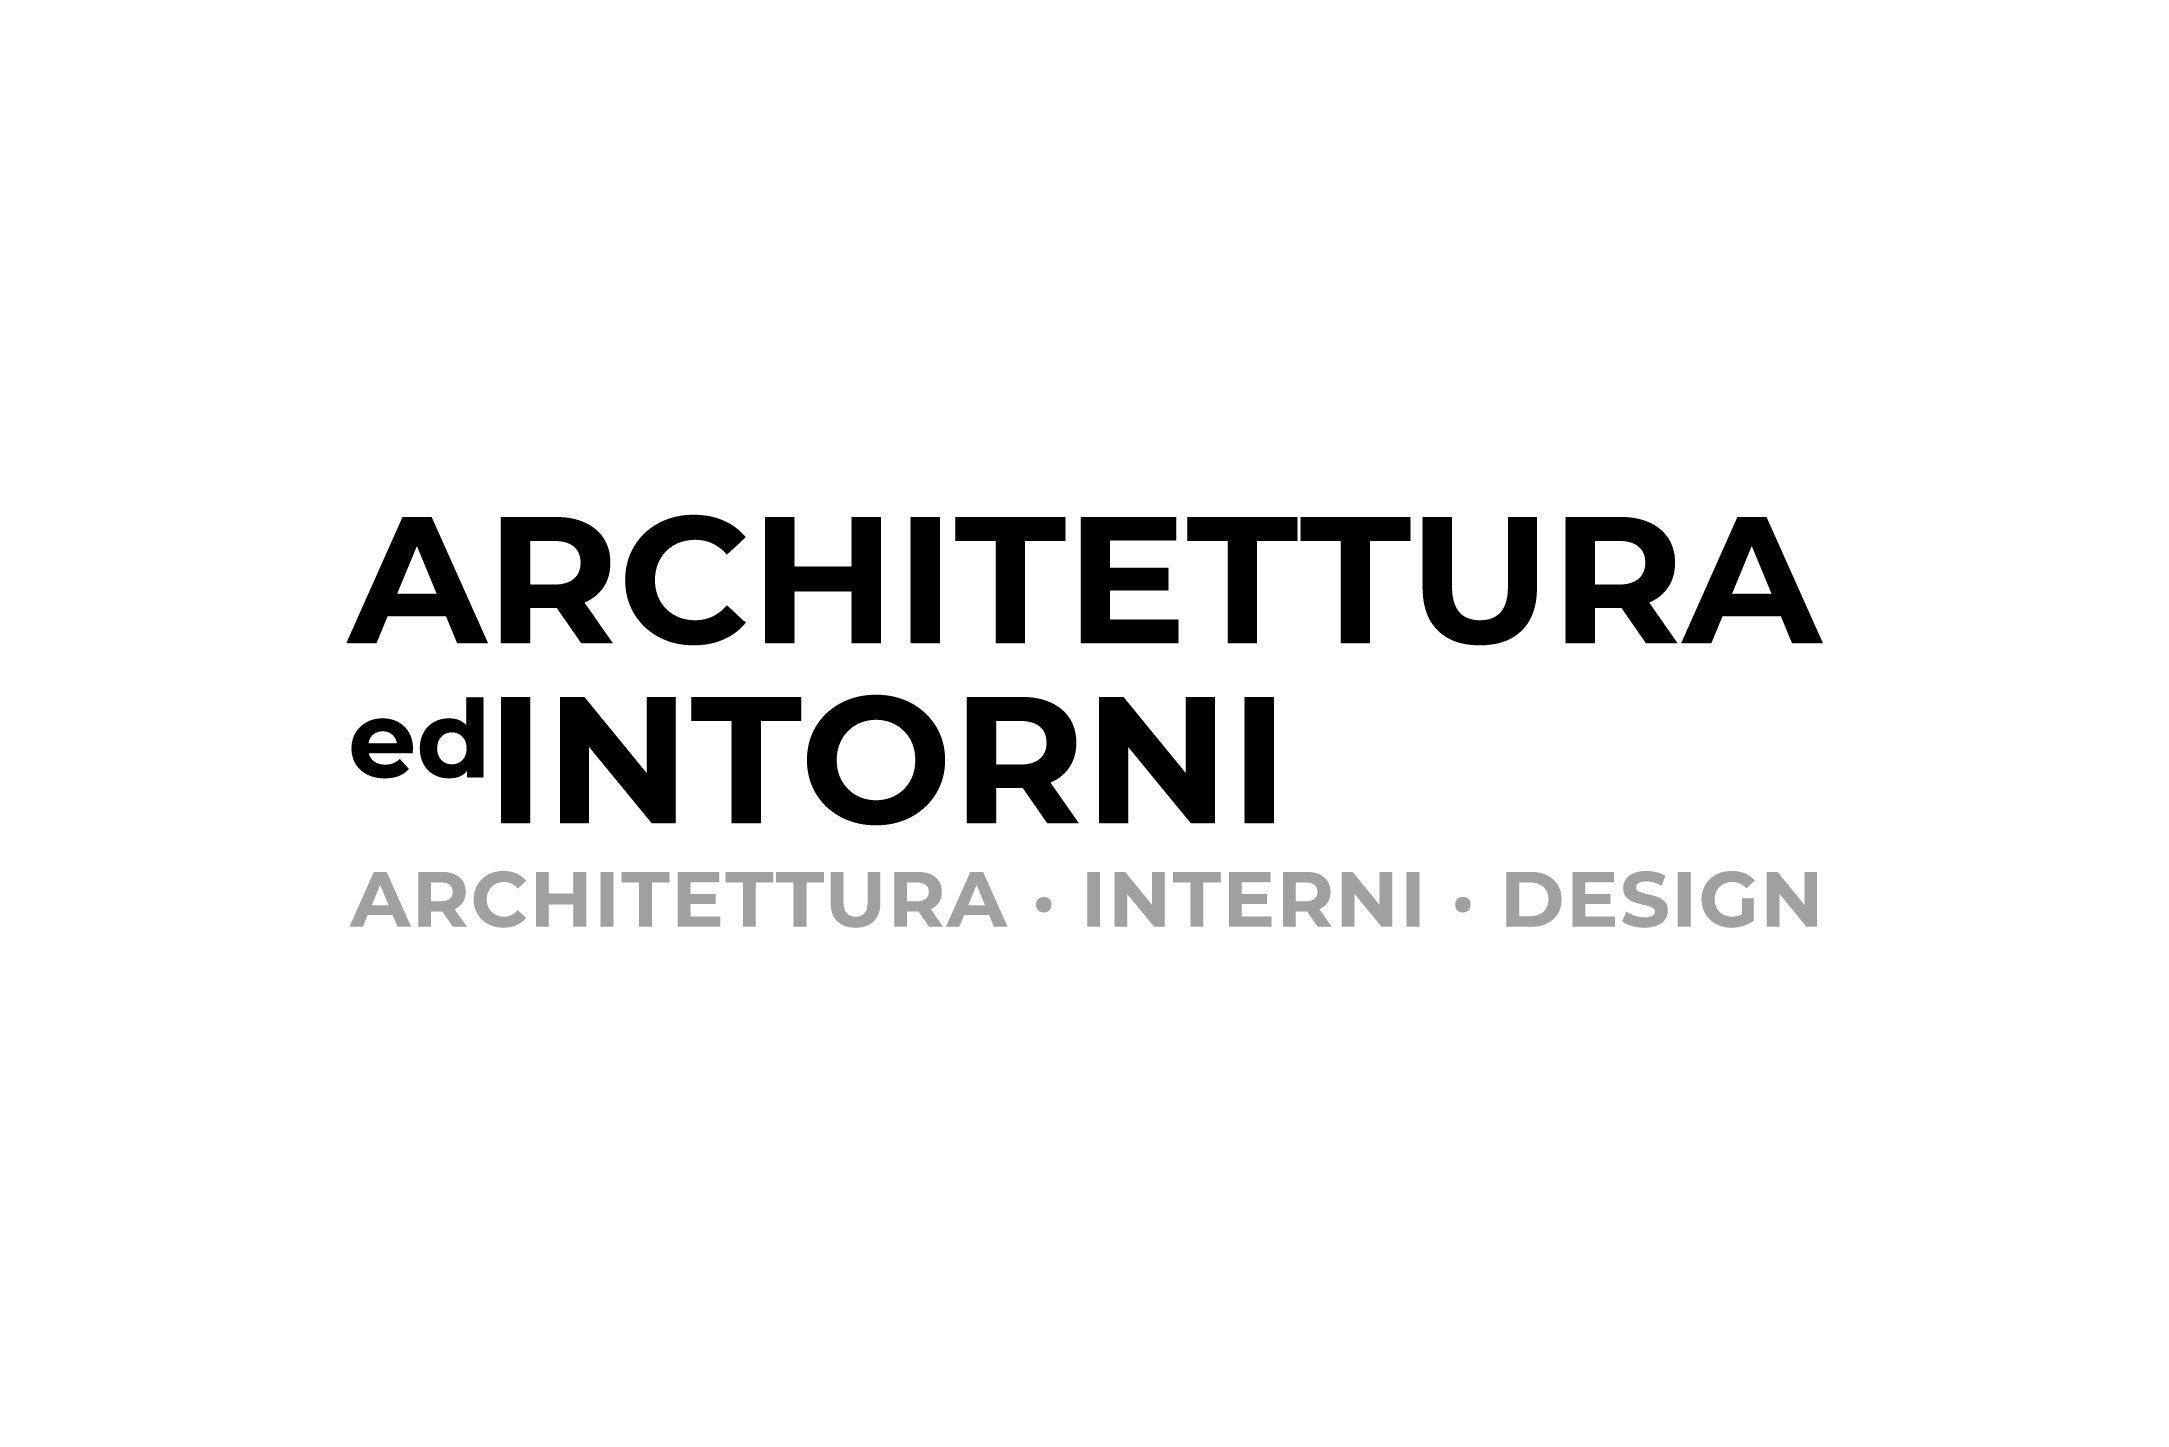 ARCHITETTURA ed INTORNI – New brand identity